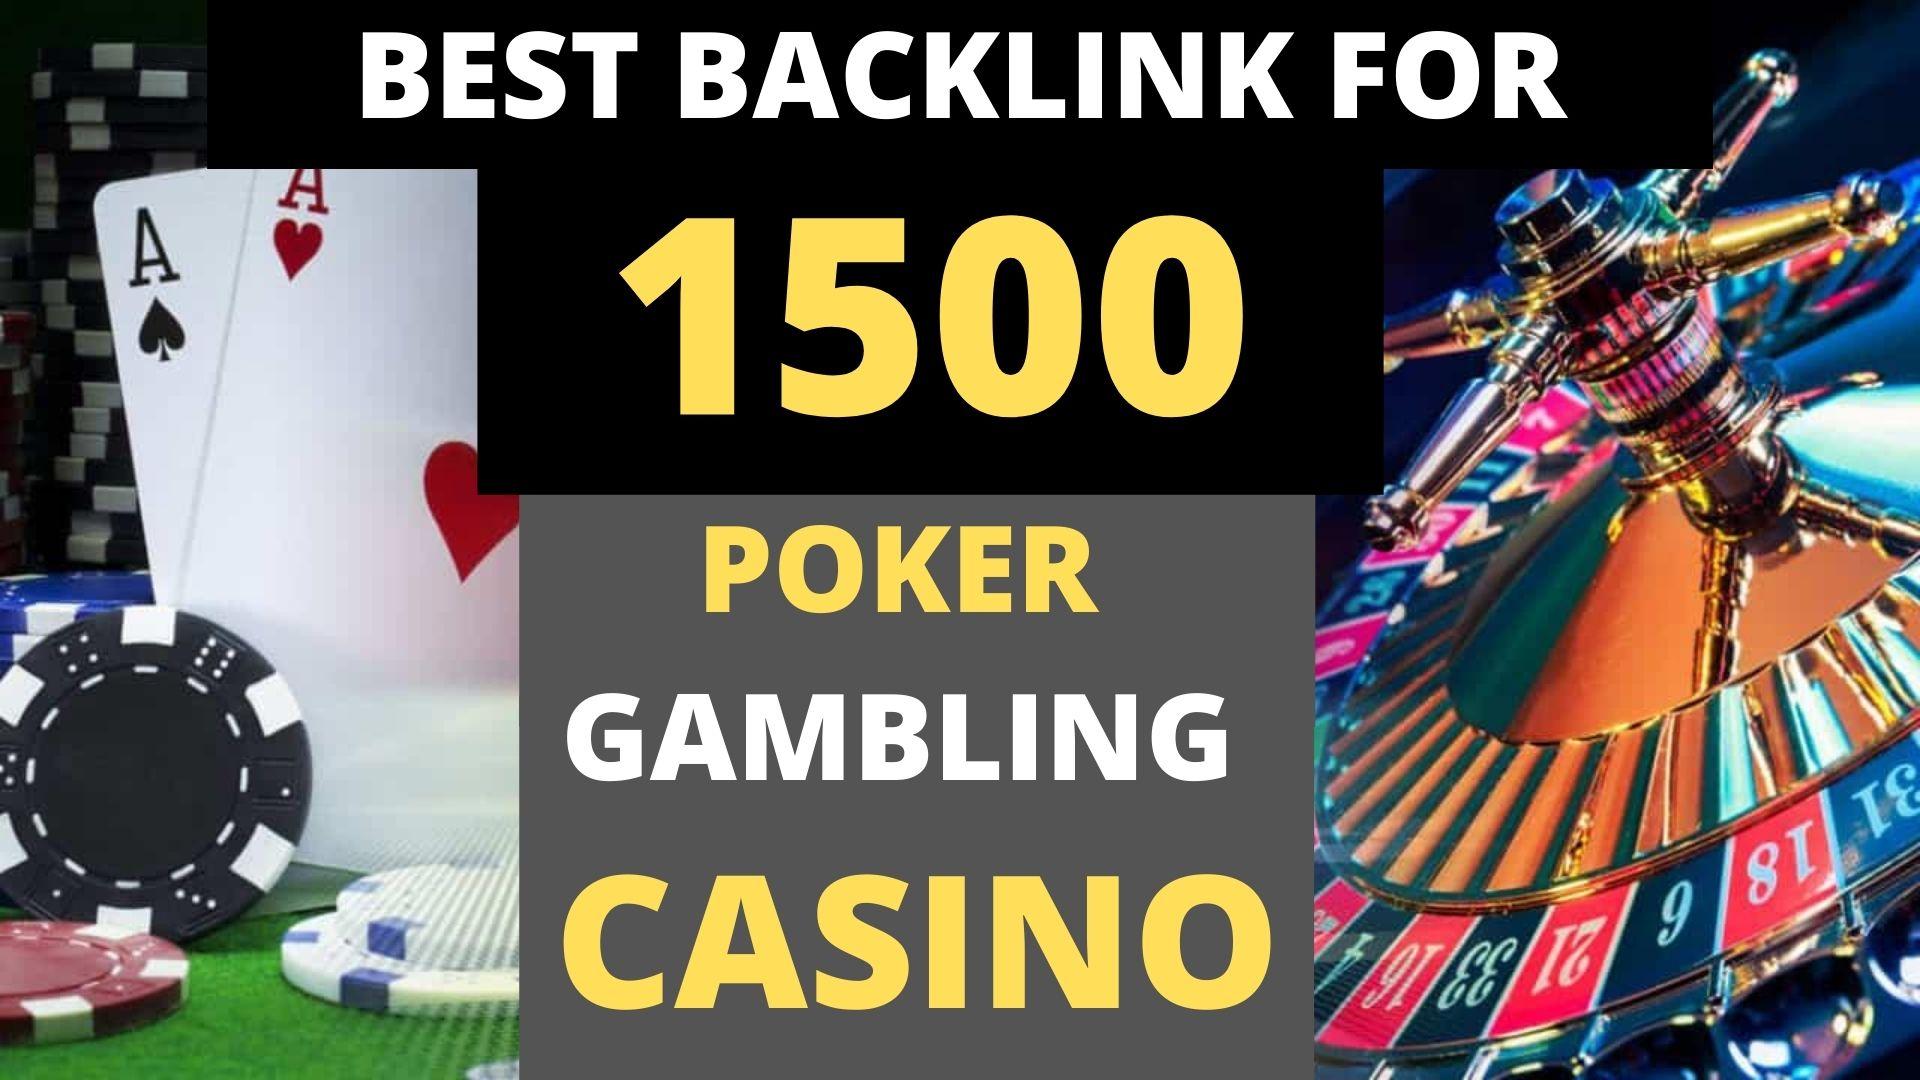 I Will Do 1500+PBN Indonesian/Thailand Keywords Casino/Poker PBN DR 30 to 70 Highly Backlinks